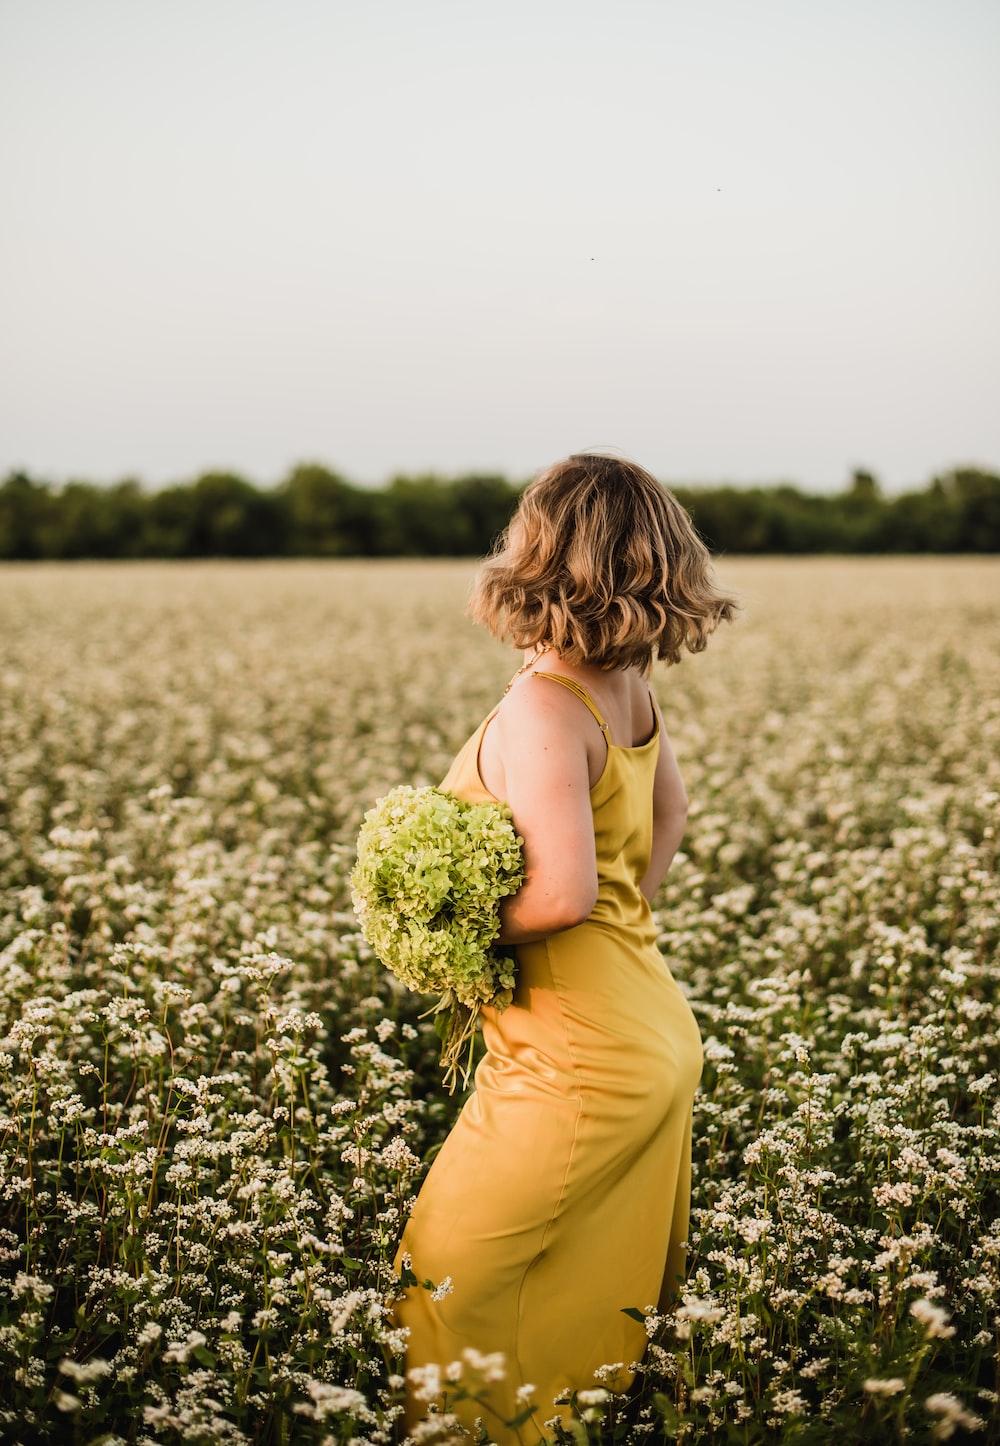 woman in yellow sleeveless dress holding yellow flower bouquet